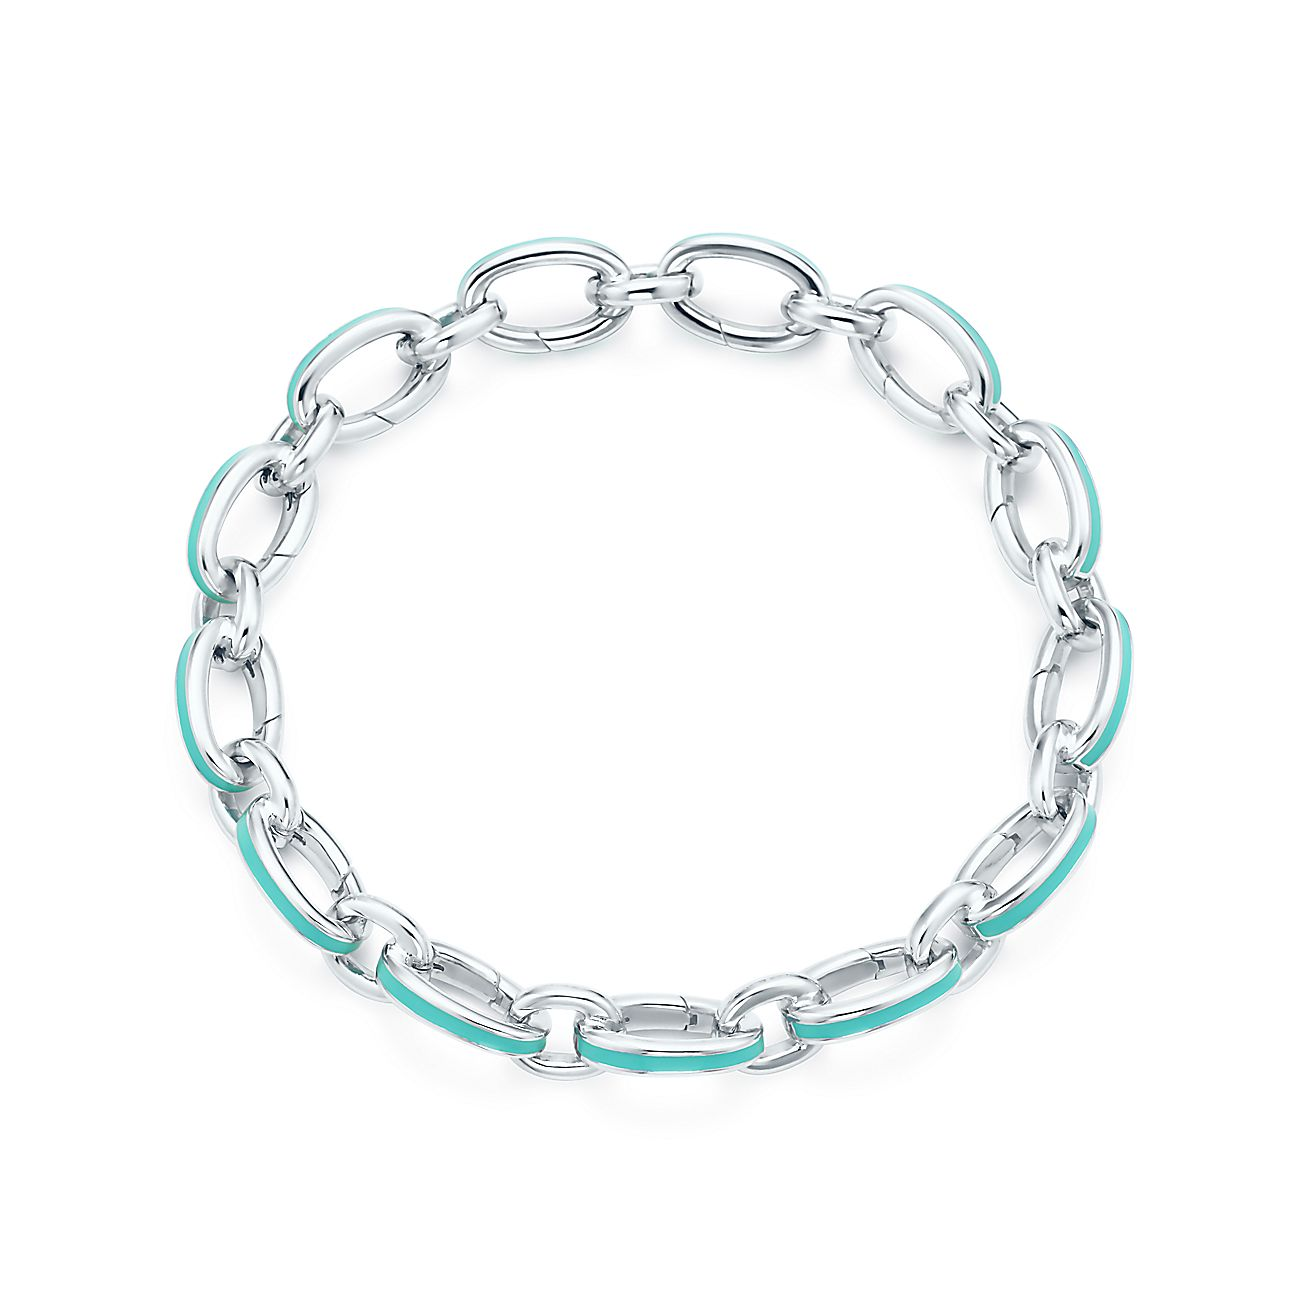 Tiffany Blue<br>Clasping Link Bracelet